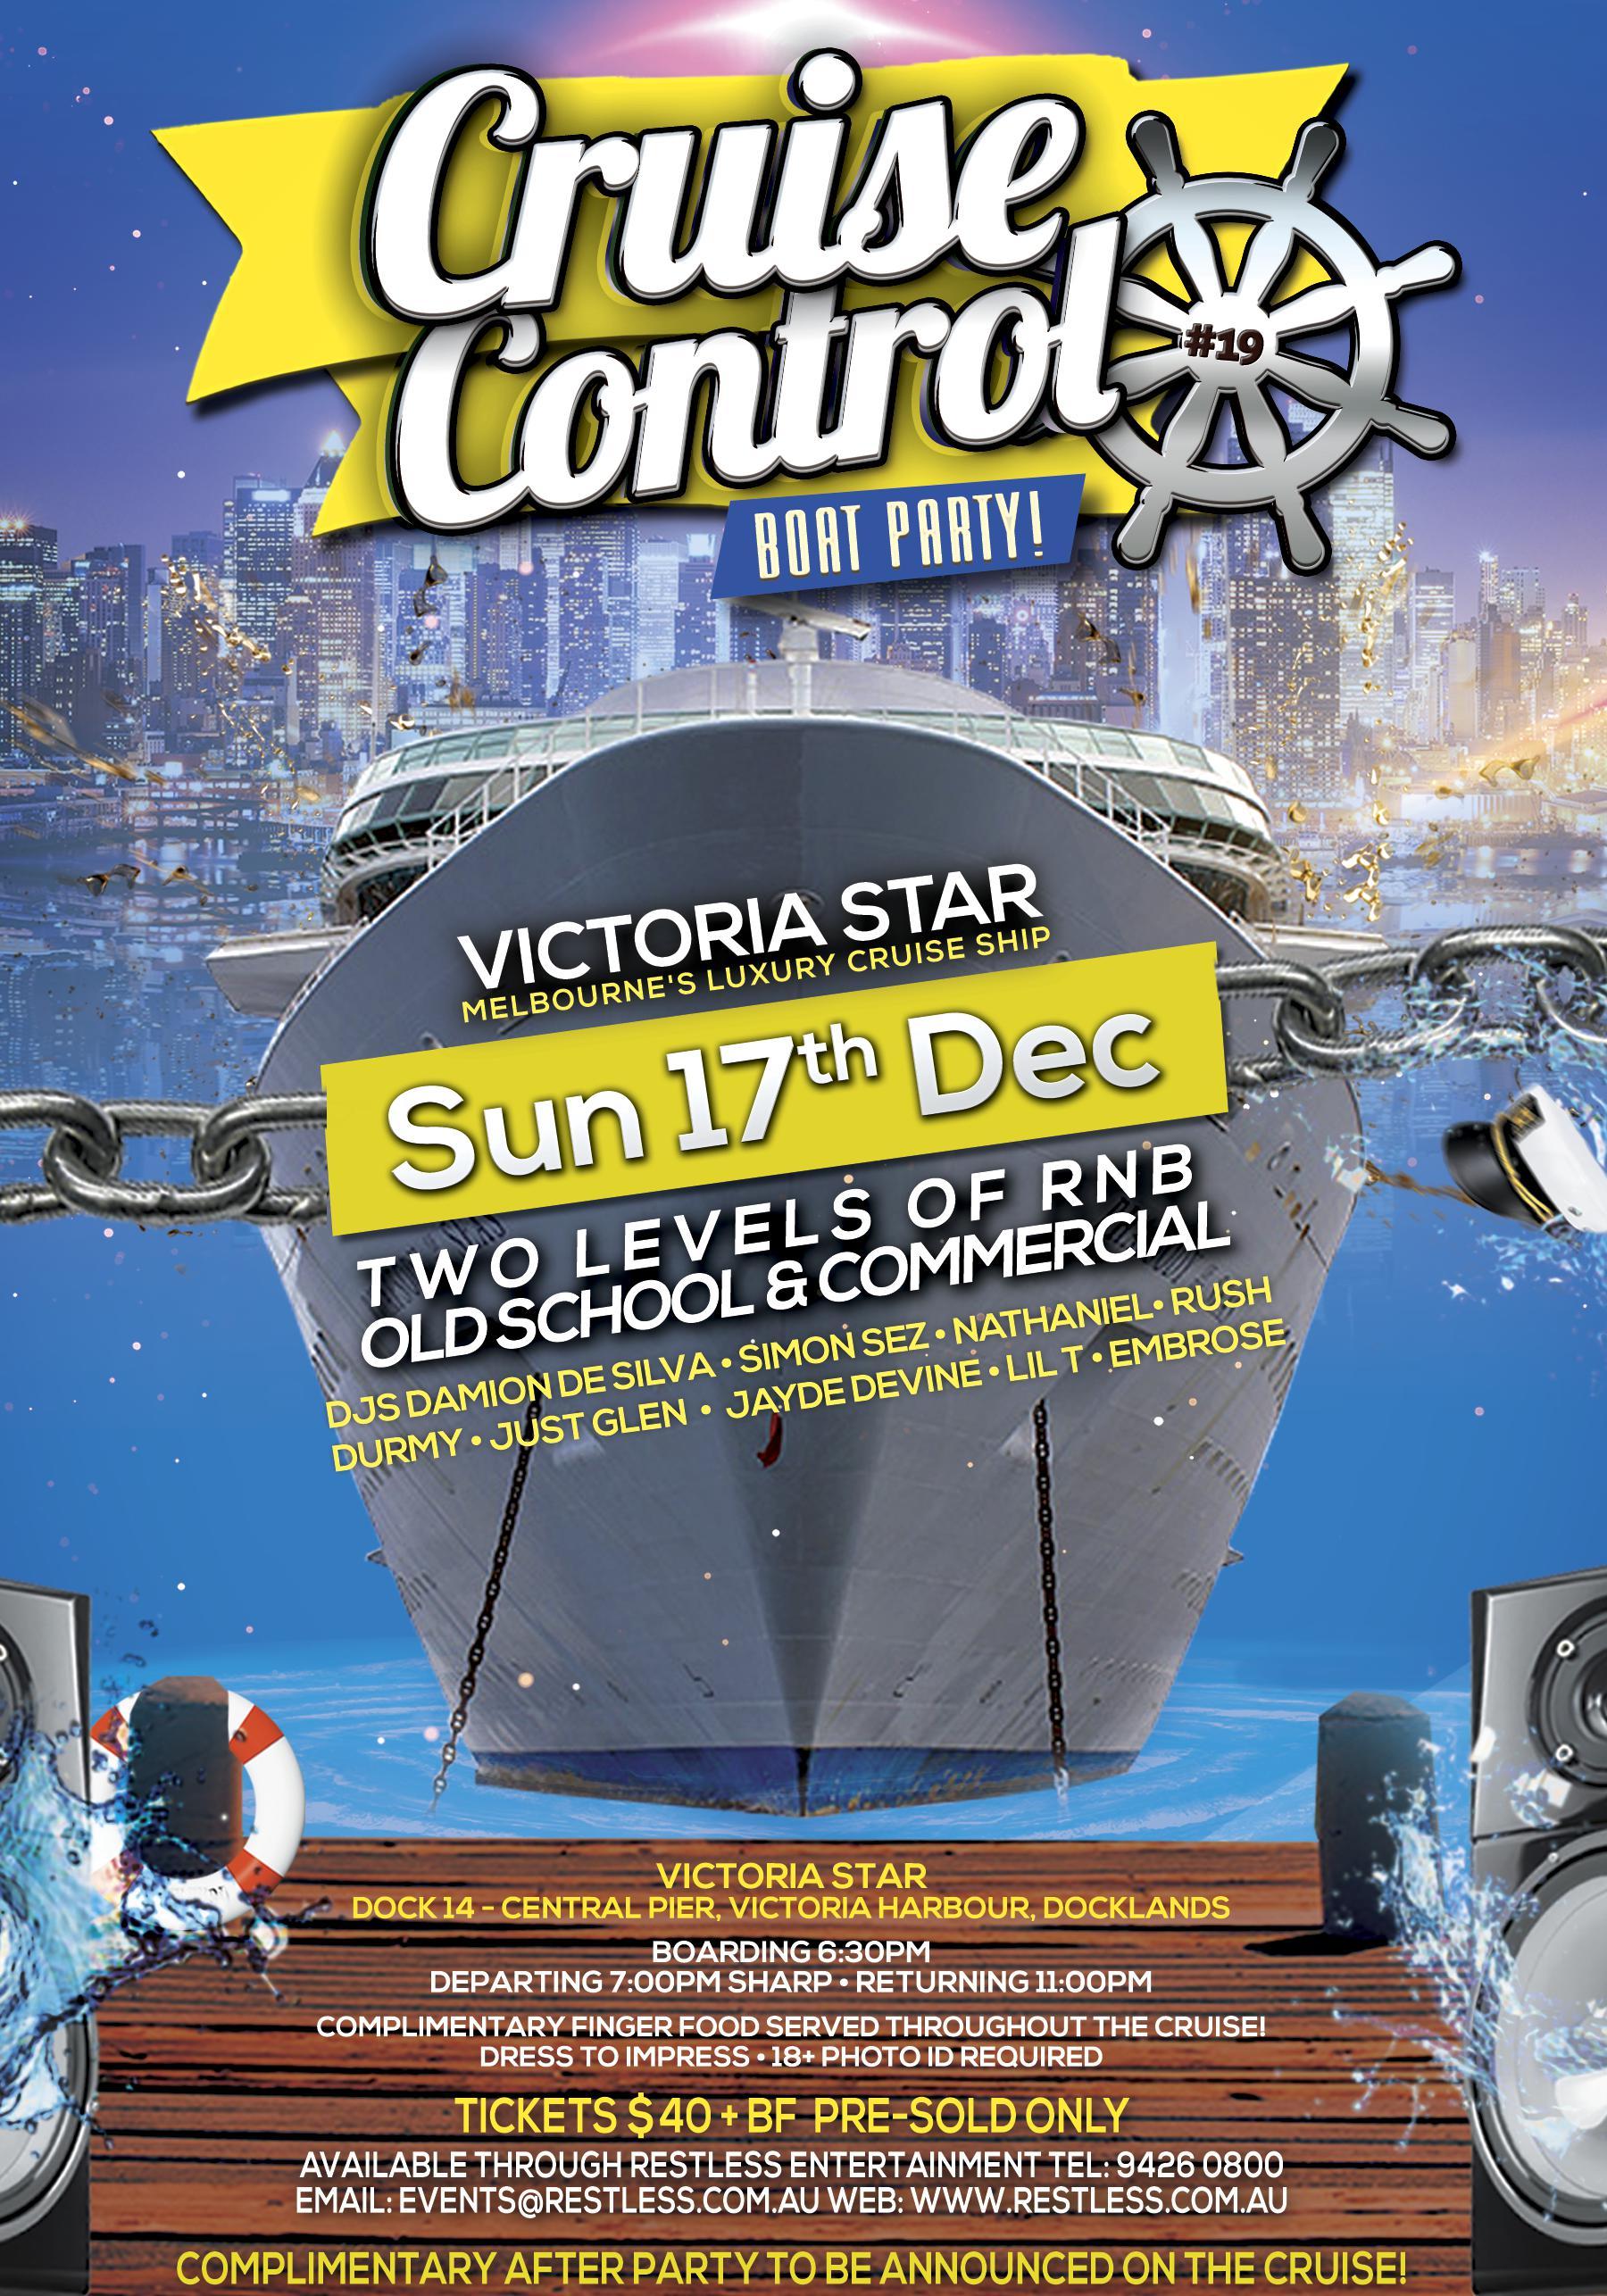 Cruise Control 2017